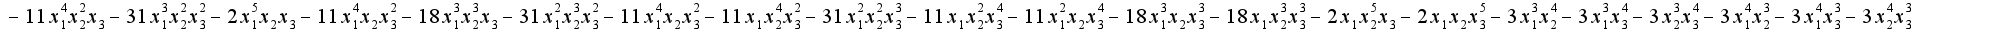 $-11x^4_1x^2_2x_3-31x^3_1x^2_2x^2_3-2x^5_1x_2x_3-11x^4_1x_2x^2_3-18x^3_1x^3_2x_3-31x^2_1x^3_2x^2_3-11x^4_1x_2x^2_3-11 x_1x^4_2x^2_3-31 x^2_1x^2_2x^3_3-11x_1x^2_2x^4_3-11x^2_1x_2x^4_3-18 x^3_1x_2x^3_3-18 x_1x^3_2x^3_3-2x_1x^5_2x_3-2x_1x_2x^5_3-3x^3_1x^4_2-3x^3_1x^4_3-3x^3_2x^4_3-3 x^4_1x^3_2-3x^4_1x^3_3-3 x^4_2x^3_3$